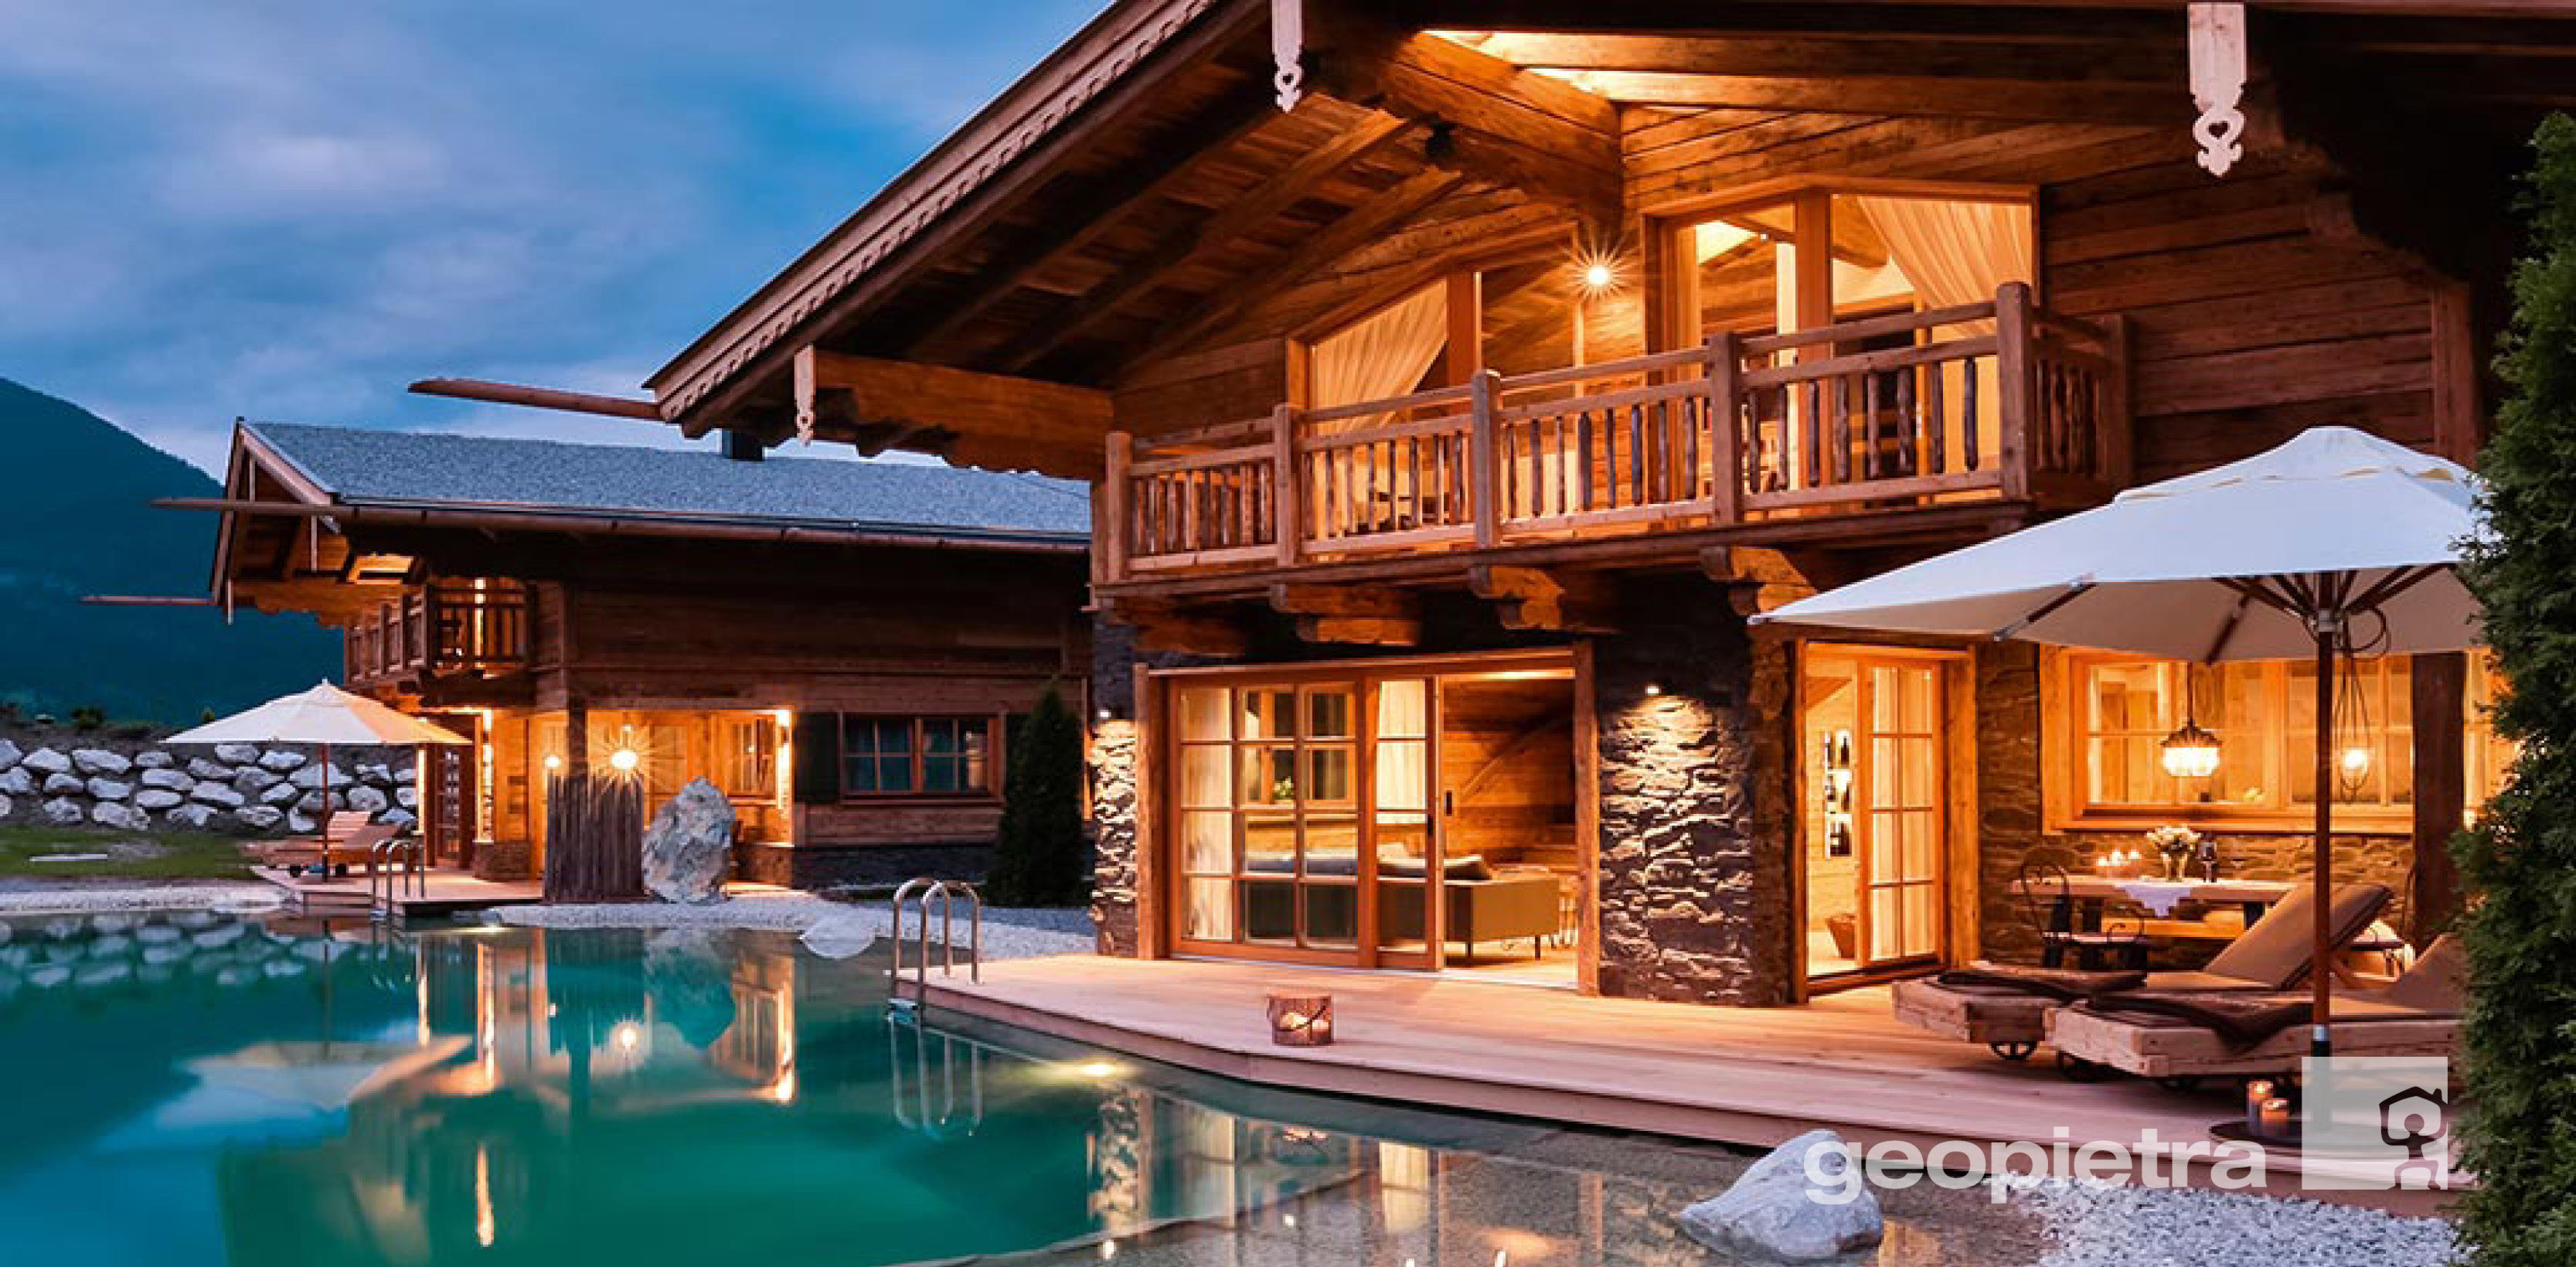 Architettura in pietra per Outdoor, Indoor, Villa, Piscina ...